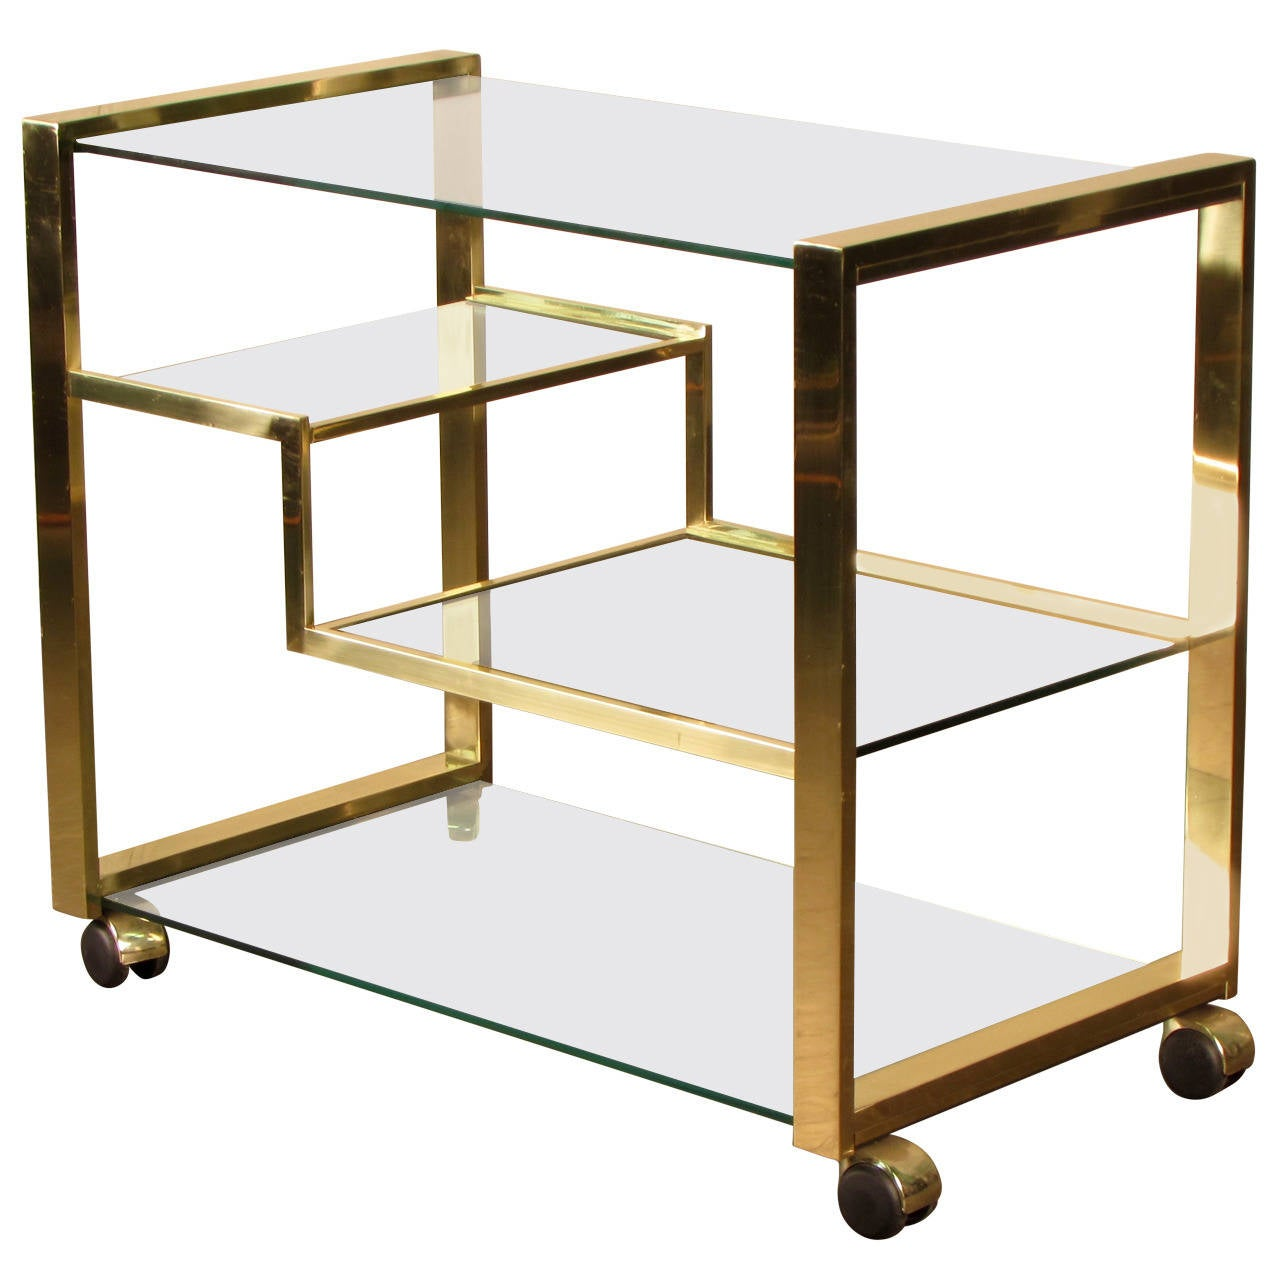 radiant brass bar cart italy 1970s at 1stdibs. Black Bedroom Furniture Sets. Home Design Ideas